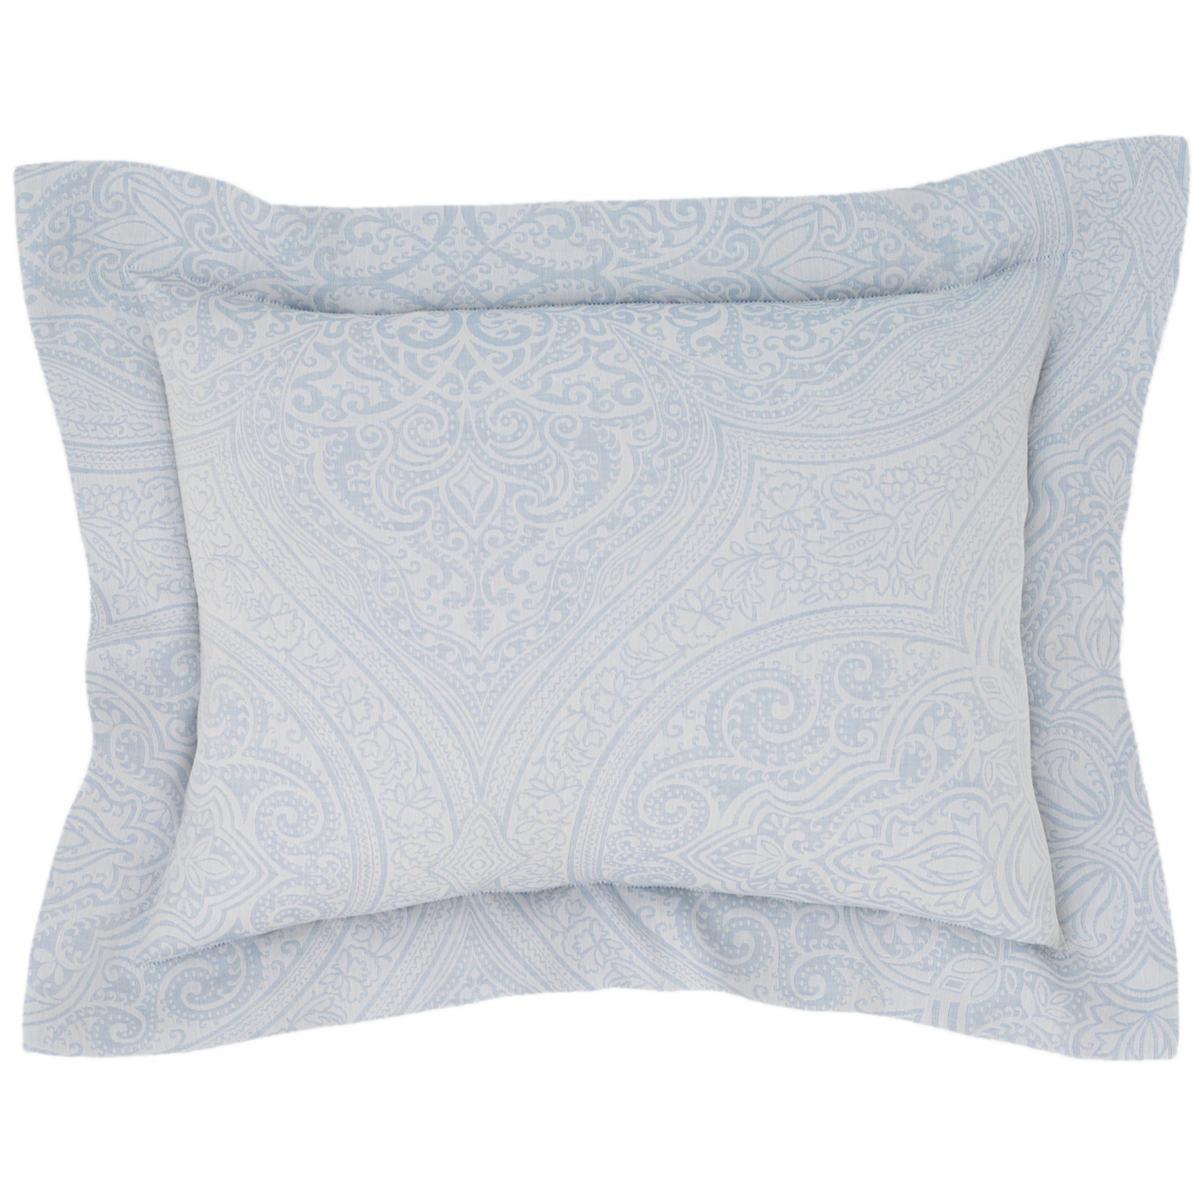 Firenze Delphinium Decorative Pillow